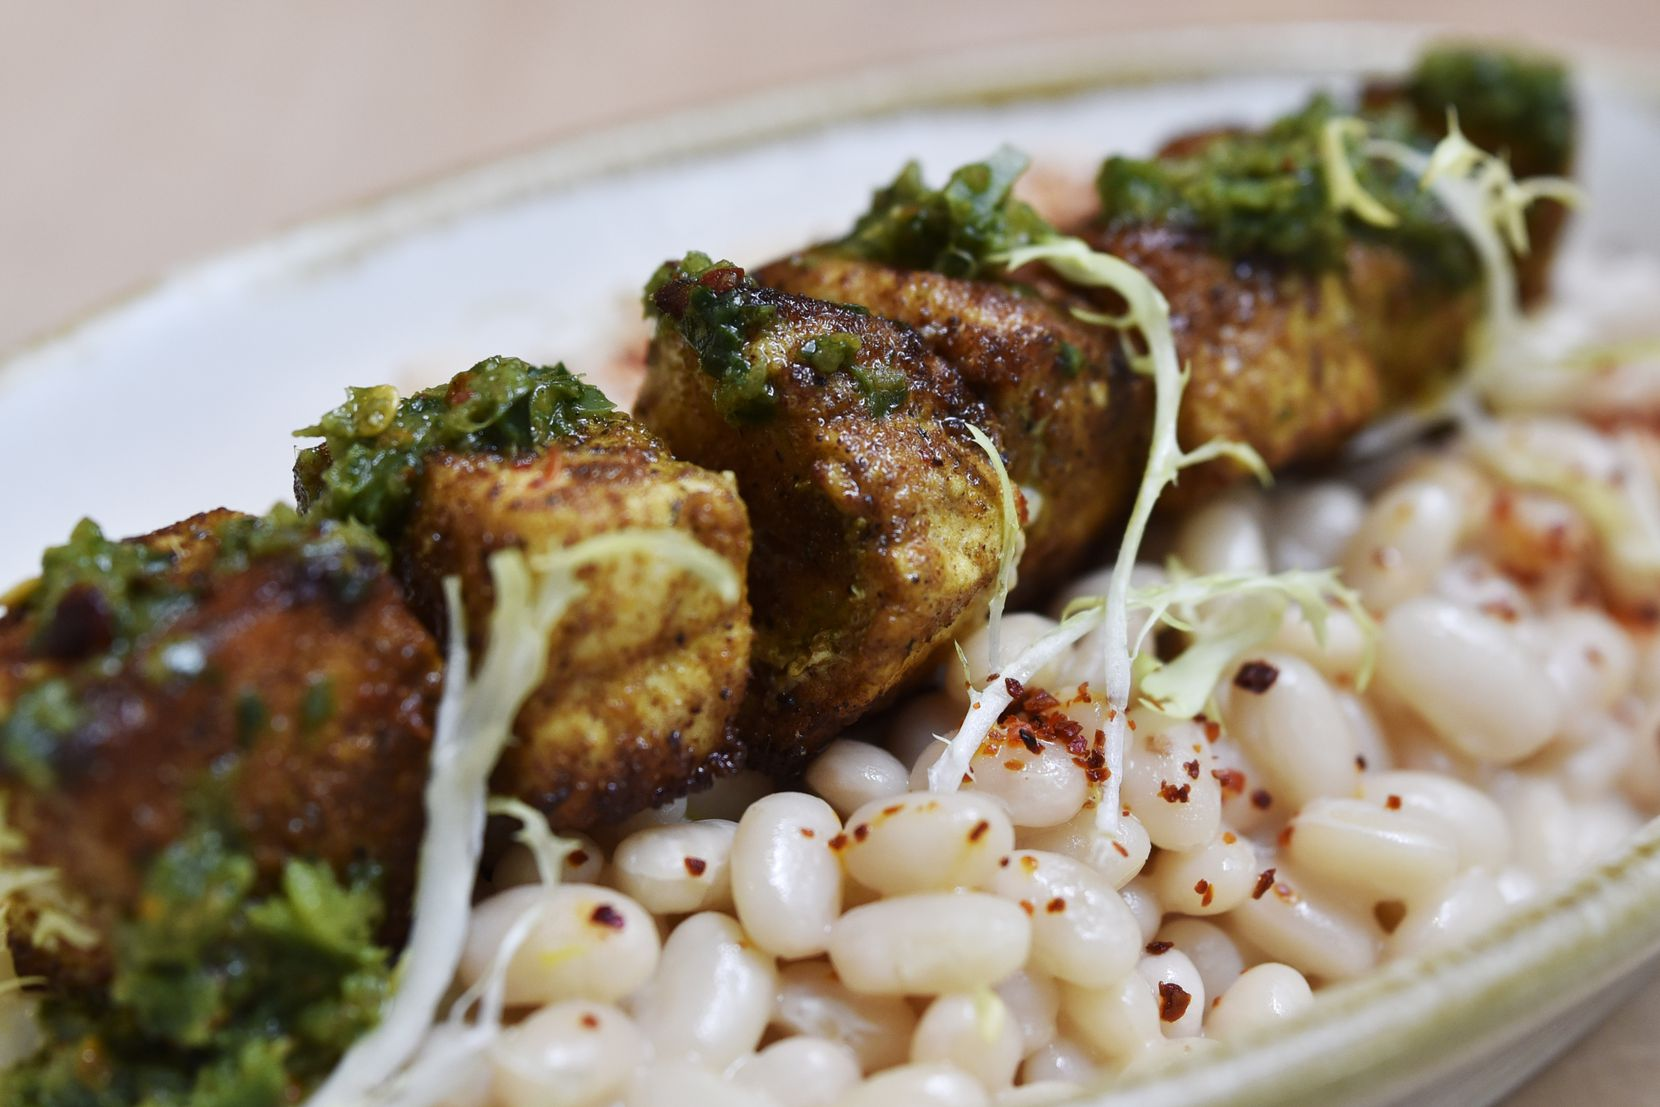 Swordfish kebab with white beans